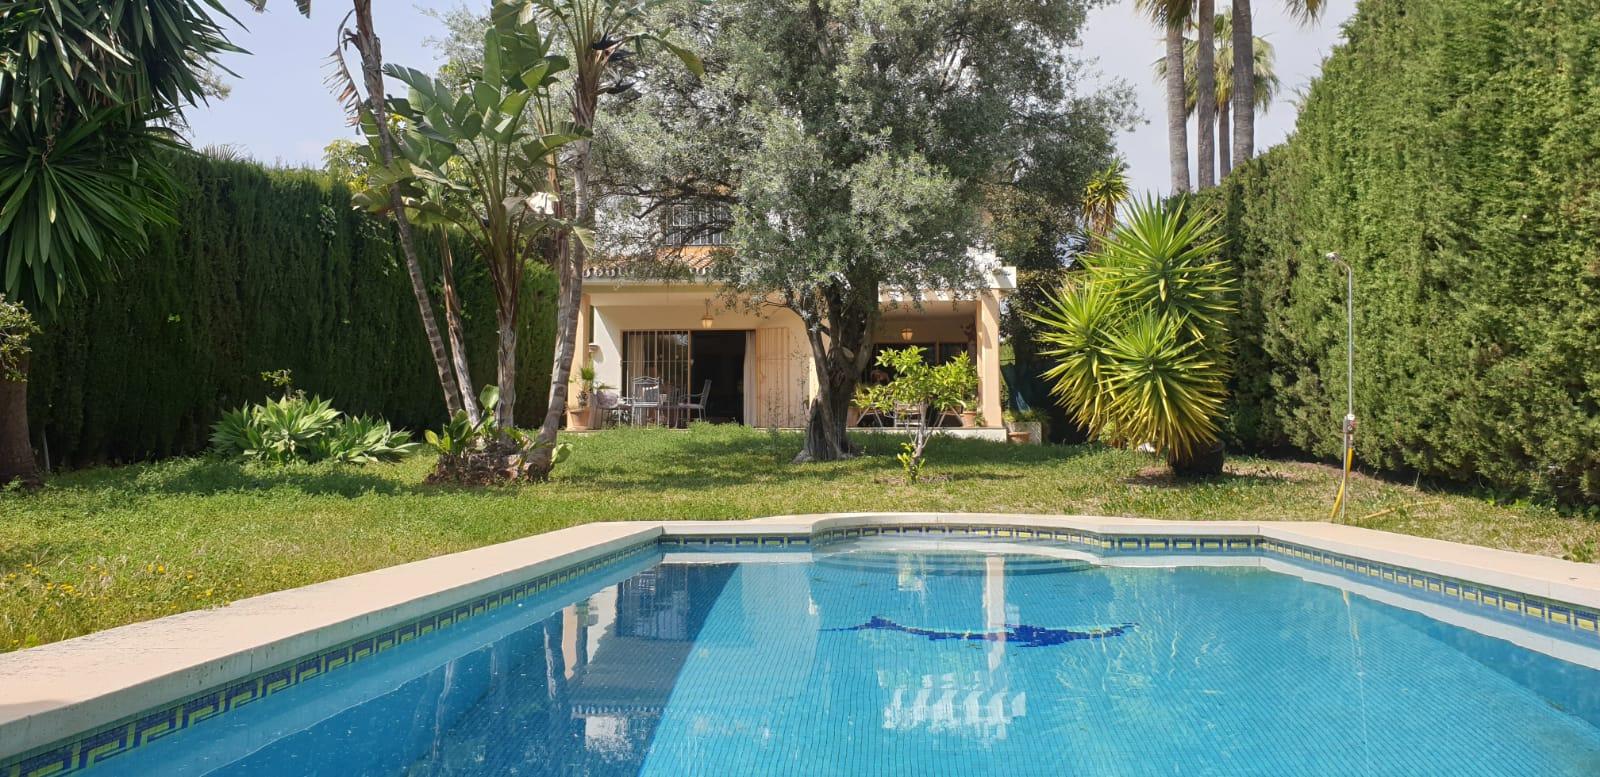 Cosy detached single-family house, Villa in Marbella